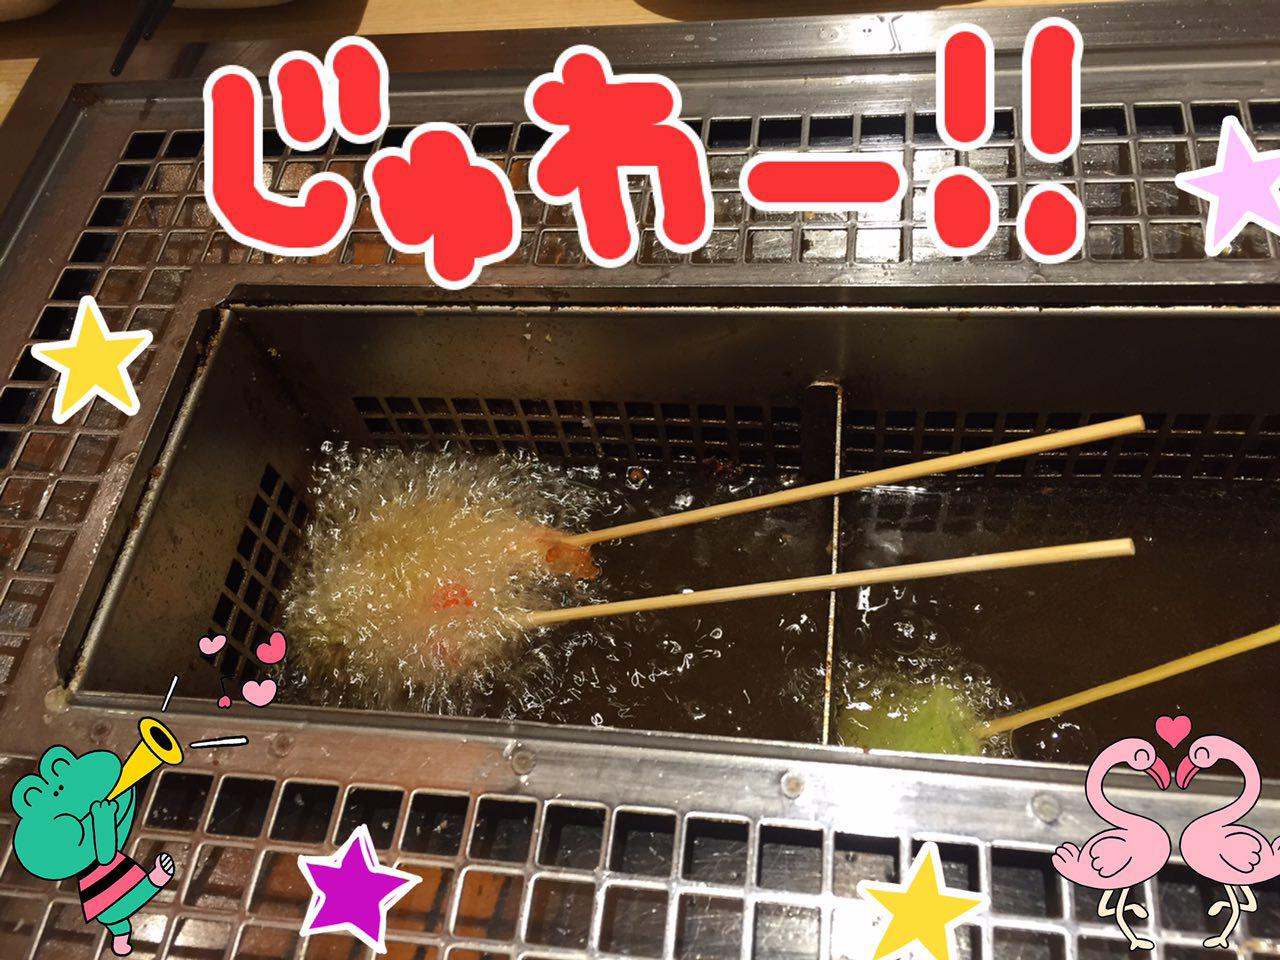 photo_2017-08-20_00-27-59.jpg